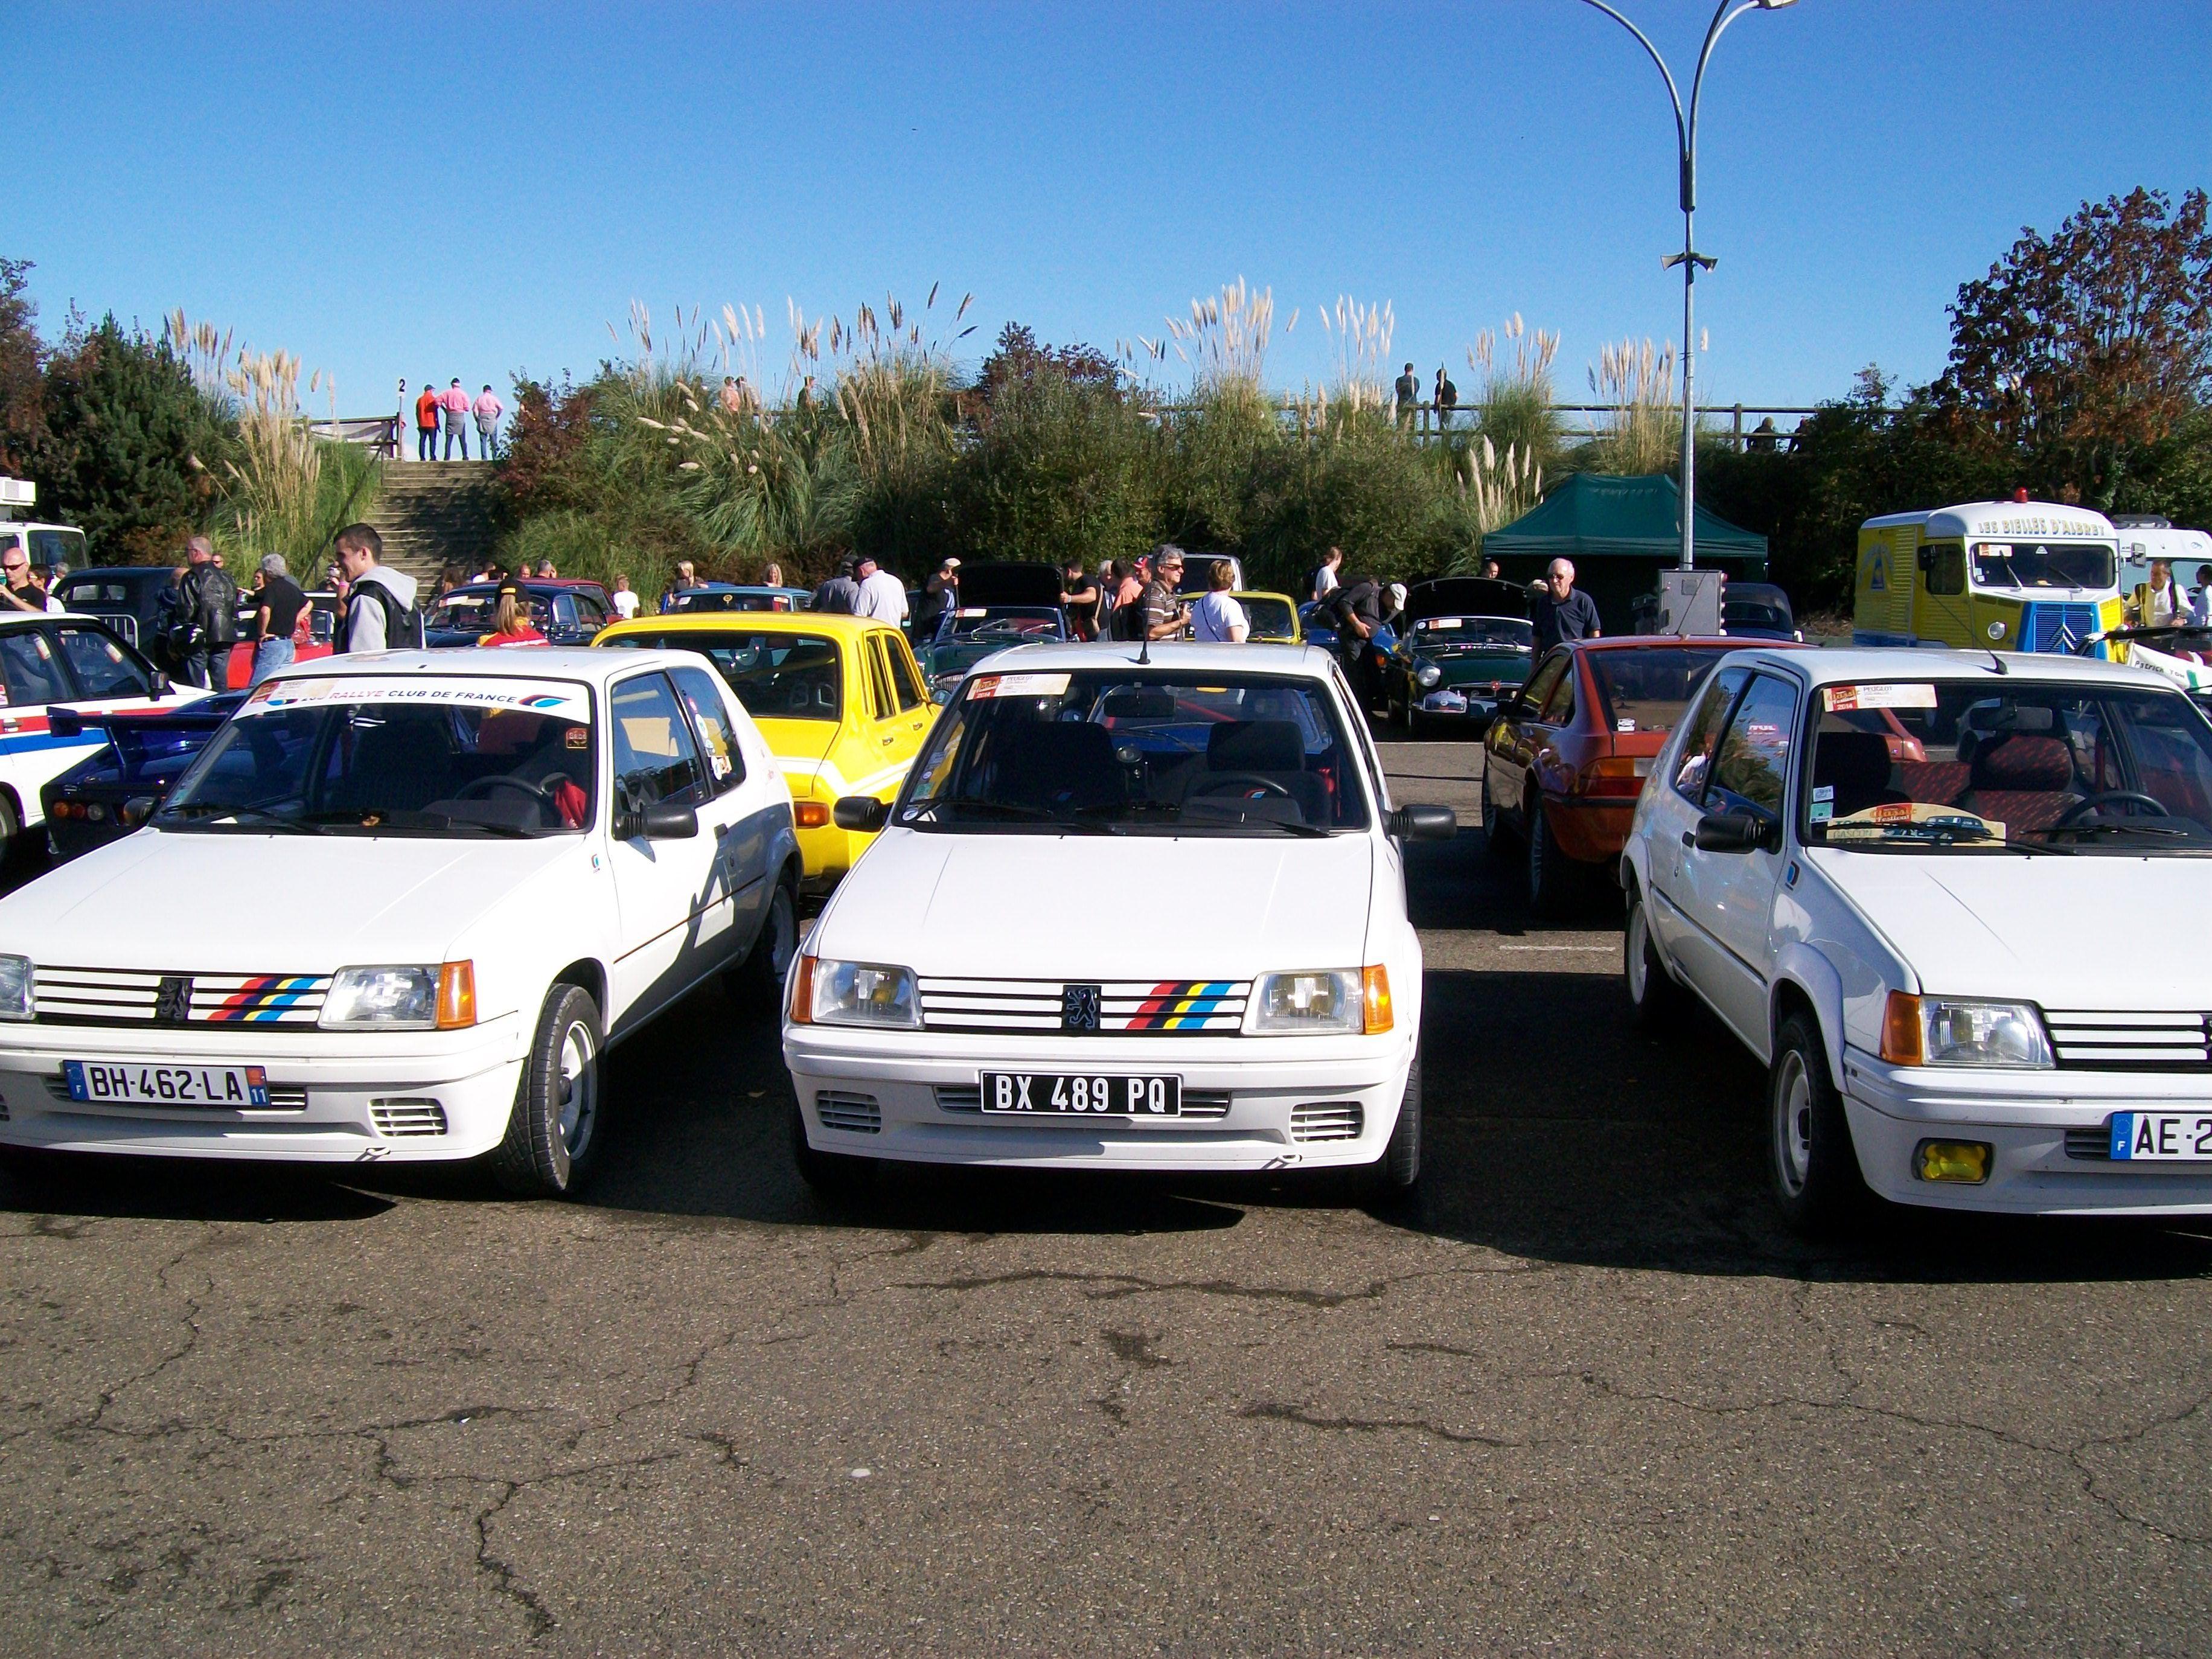 205 Rally Car Vehicles Rally